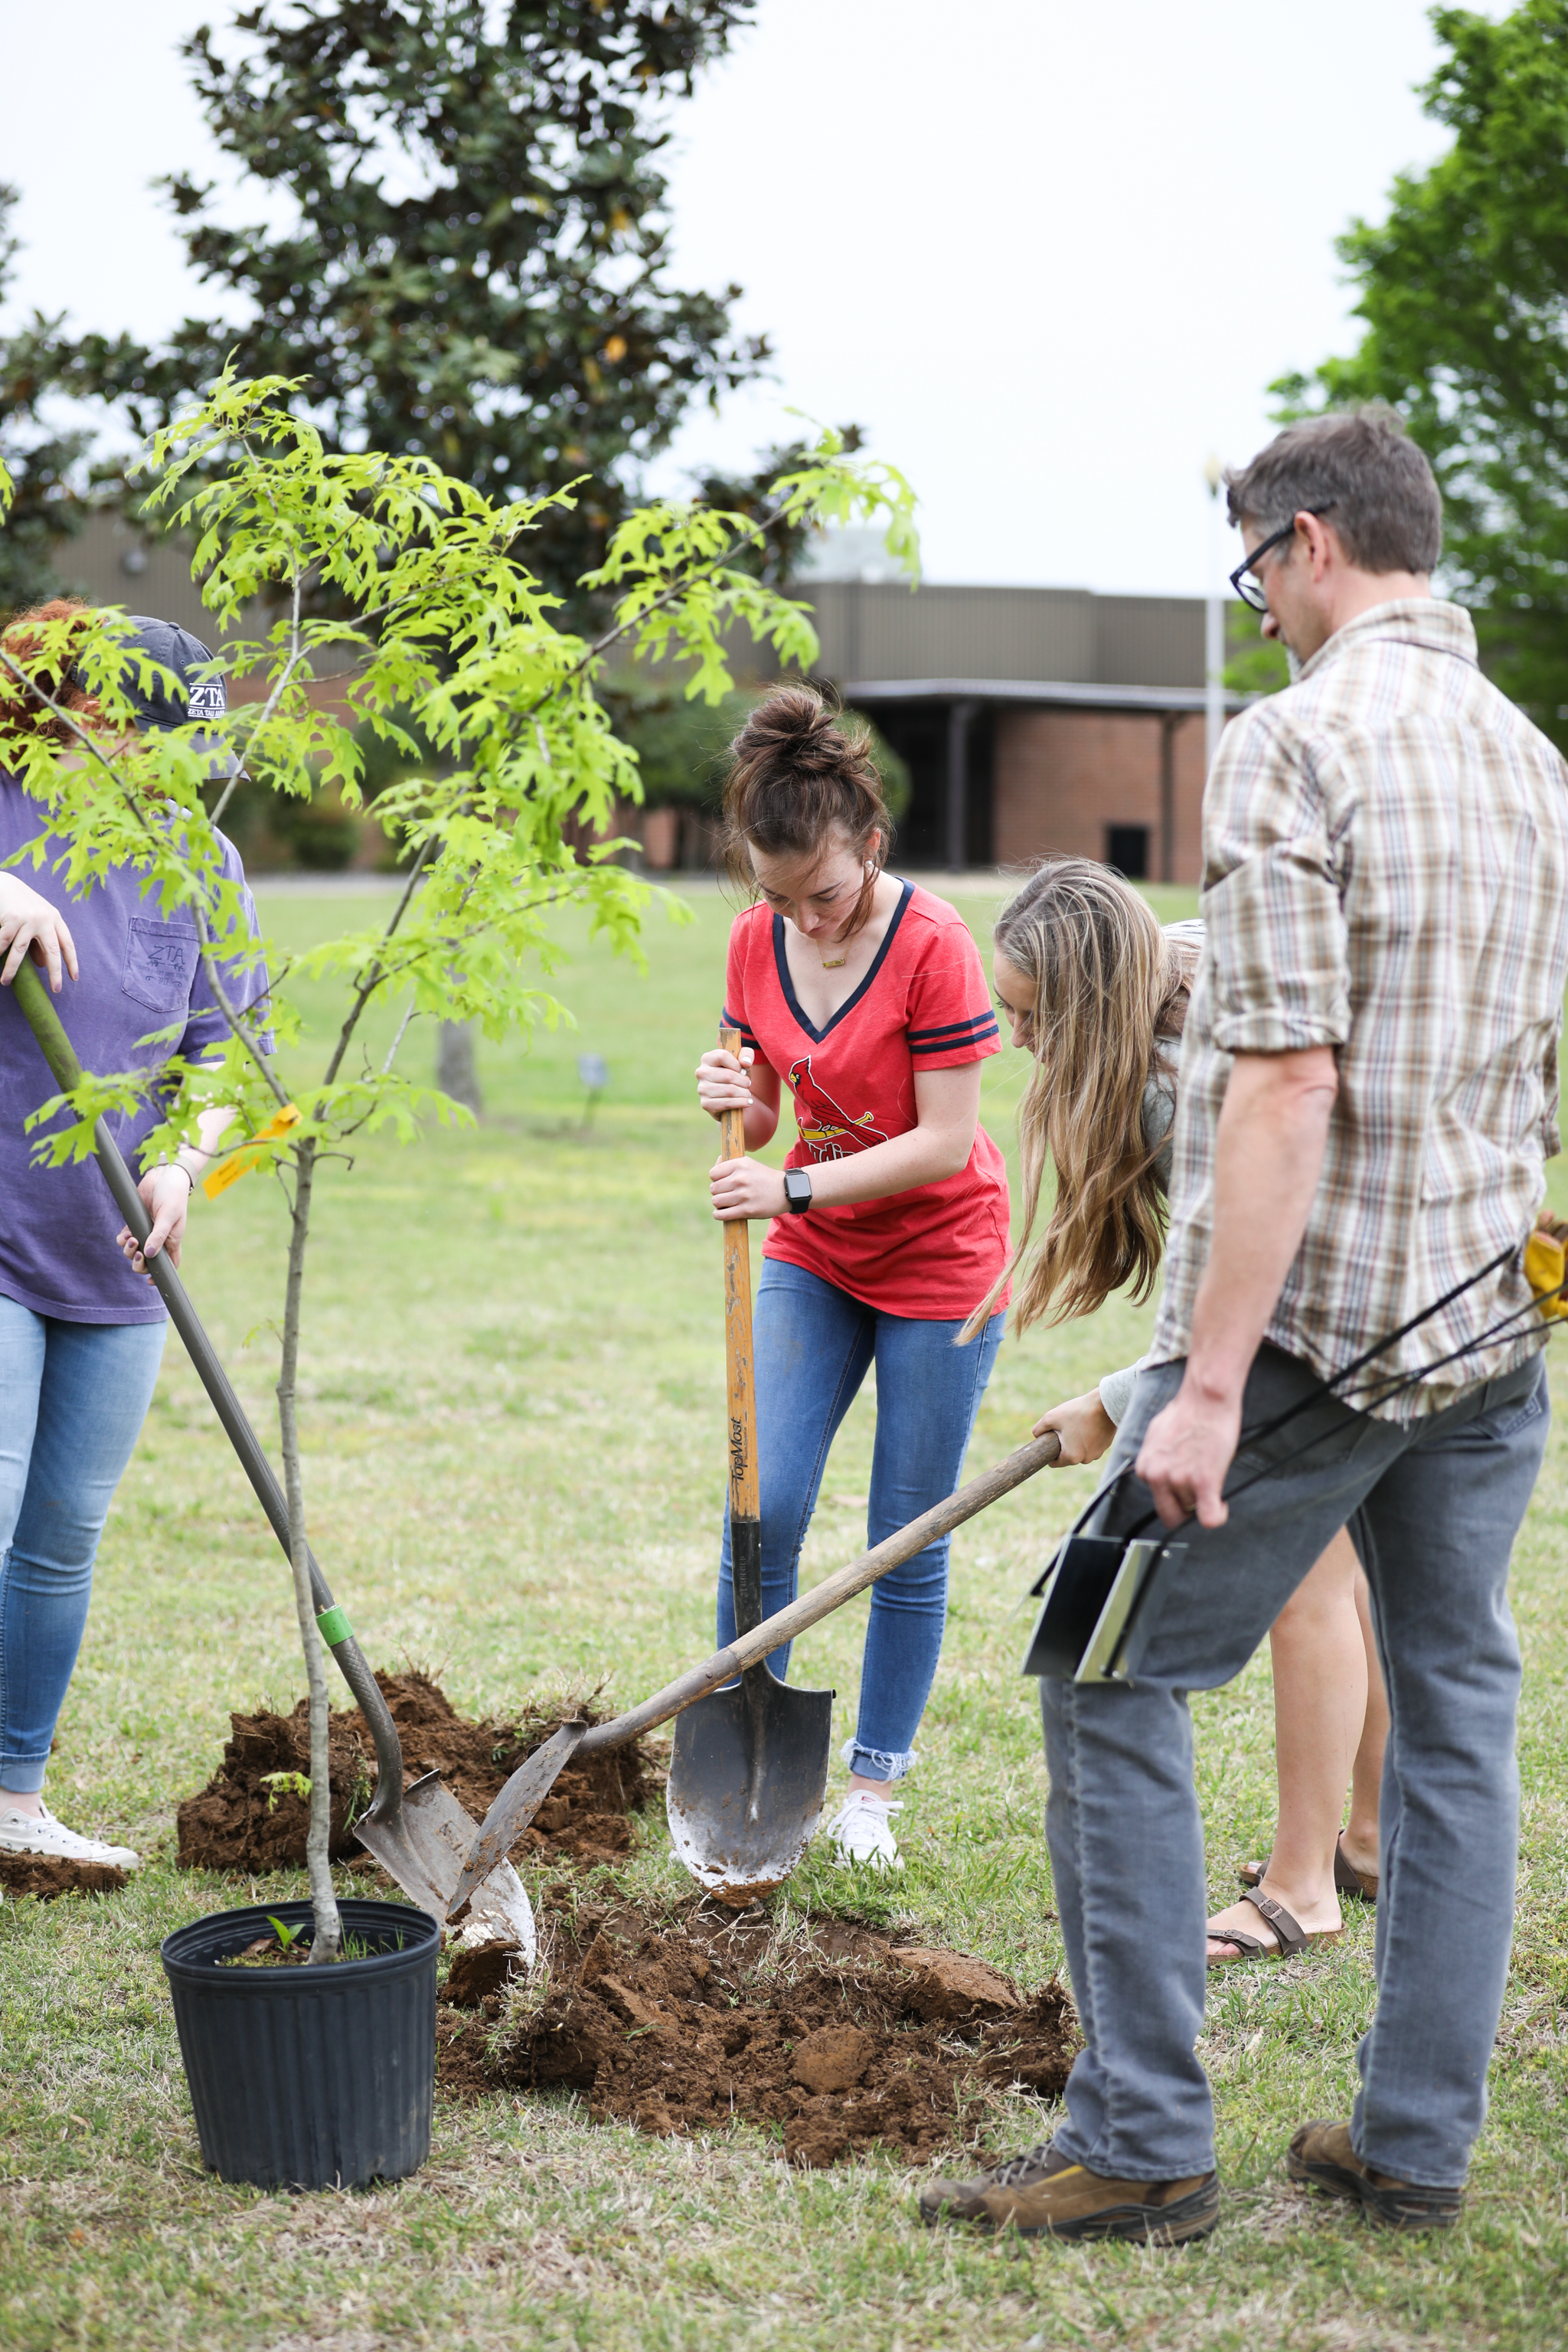 180425_KMW_BiologyPlantingTrees_206